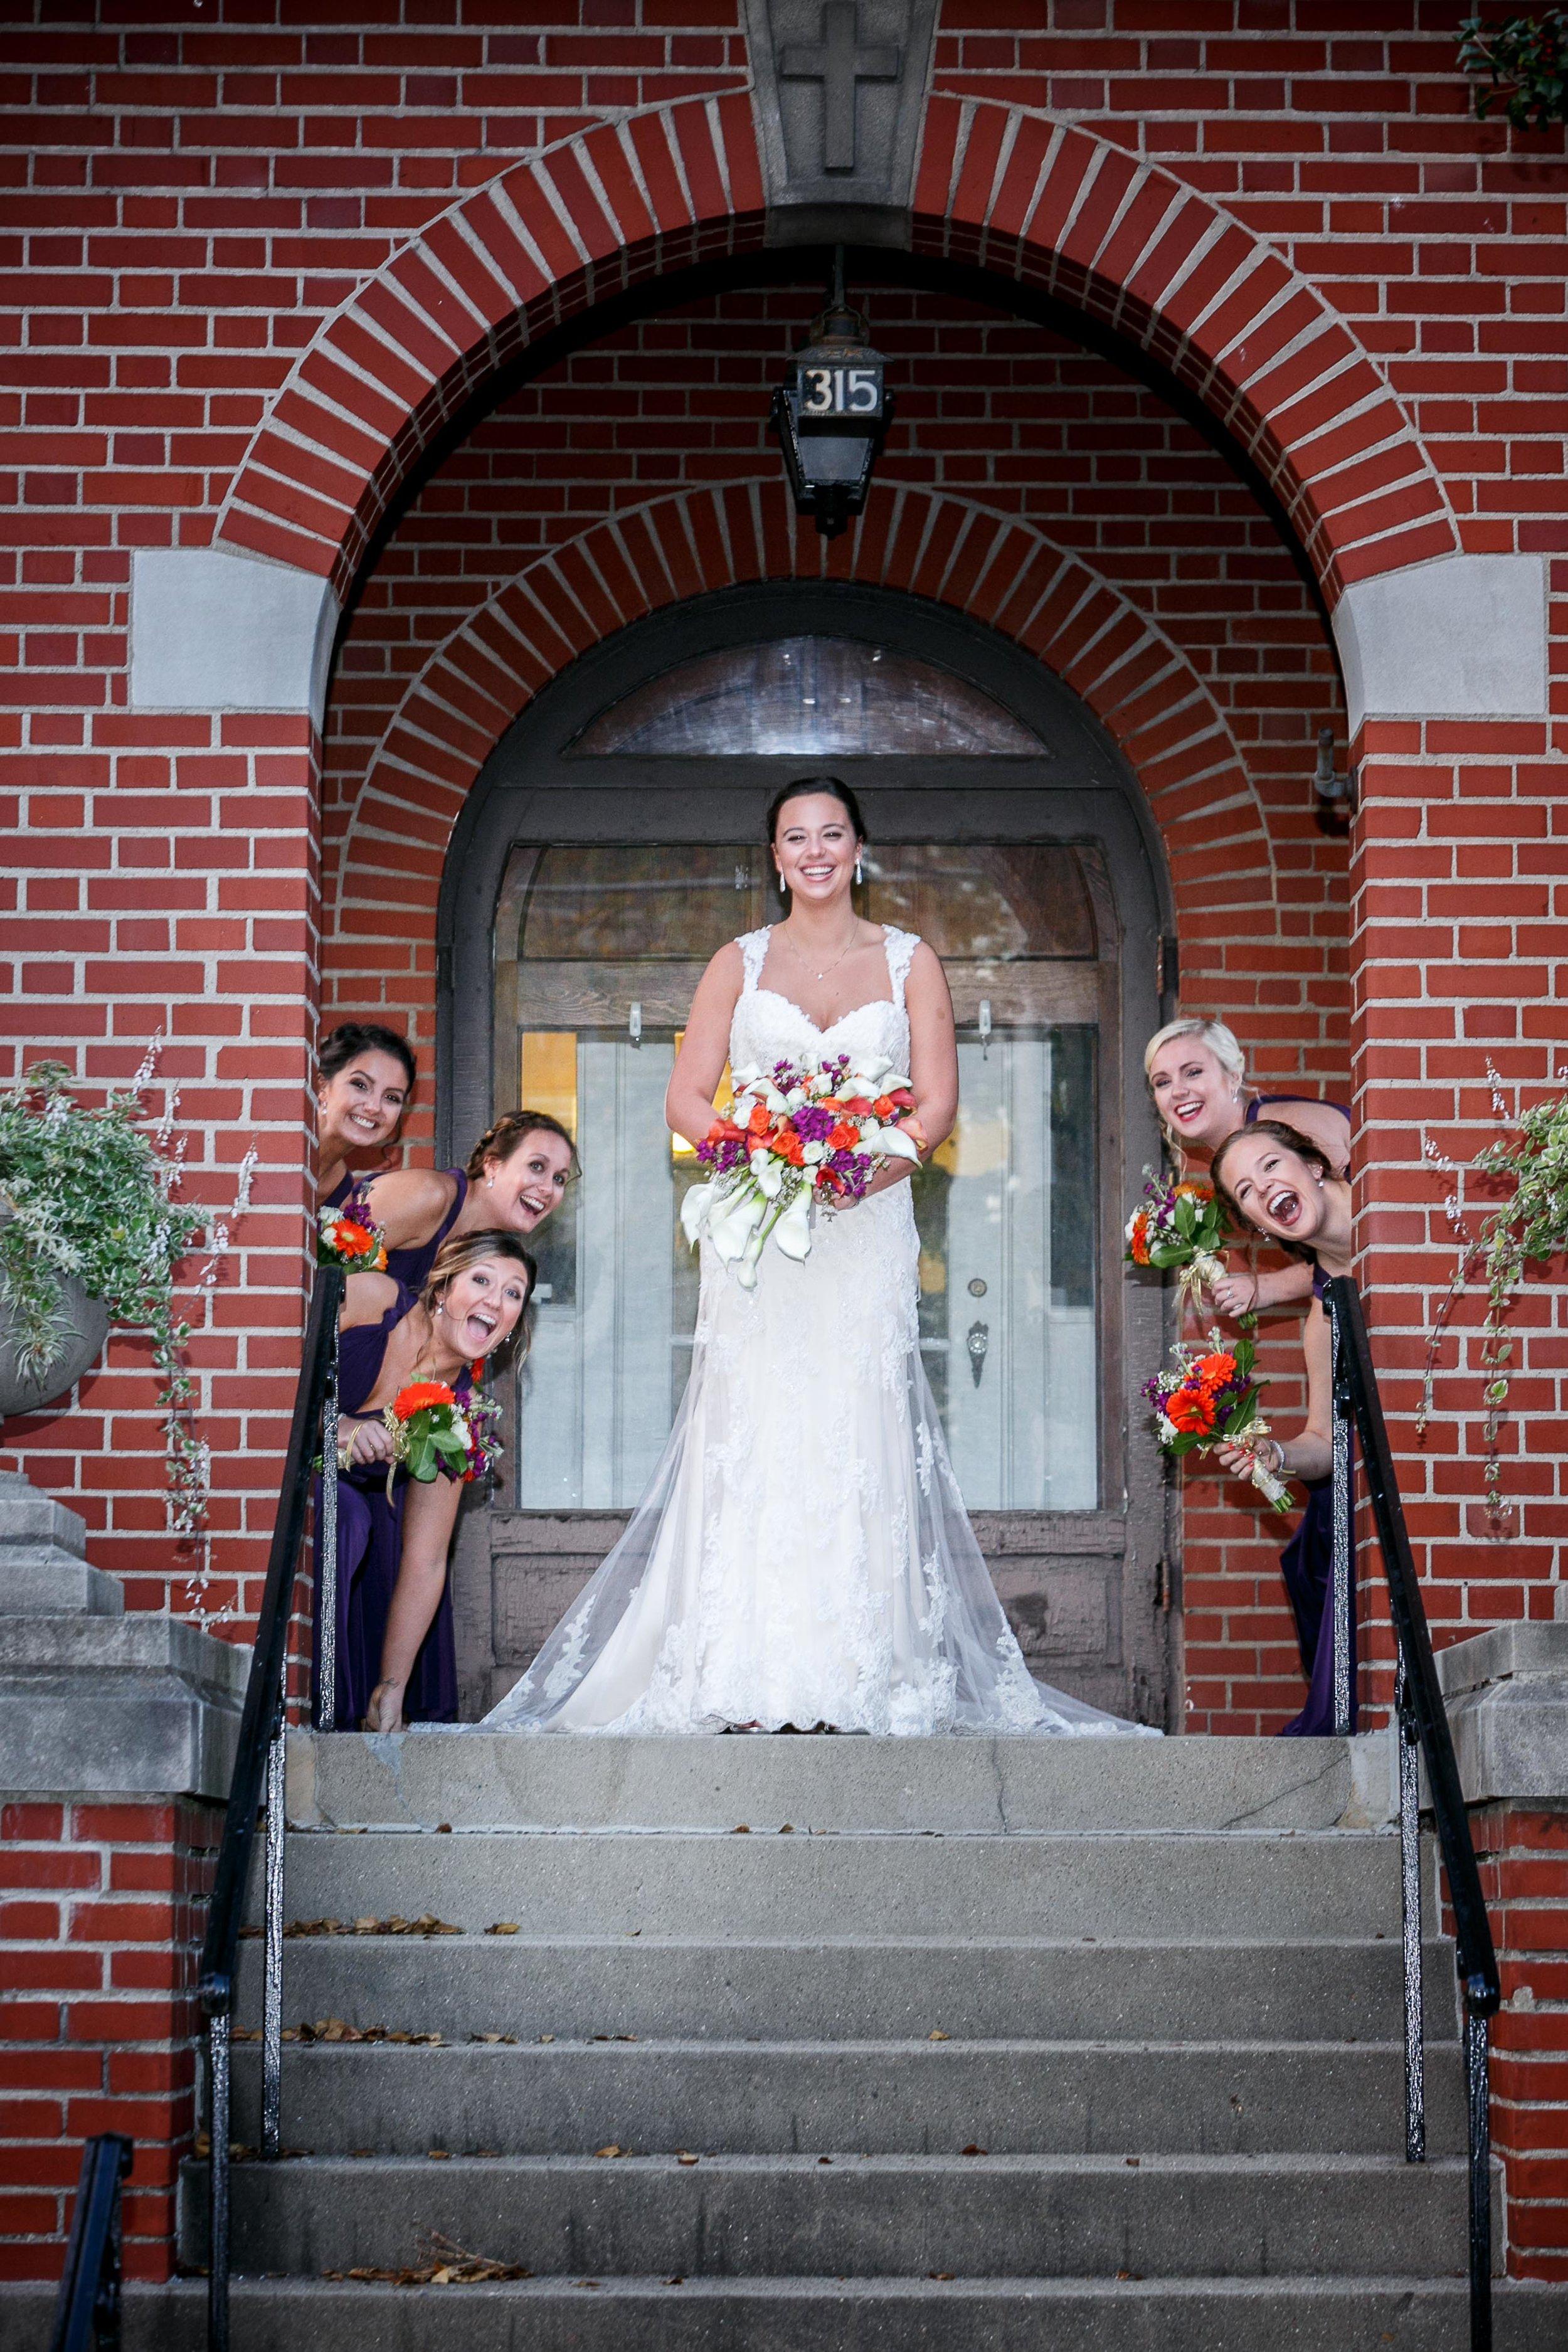 wedding photography, wedding photographer, Louisville wedding photography, Louisville, New Albany, Jeffersonville, Clarksville, professional photographer, photojournalism, full day wedding photography, St Augustine Church